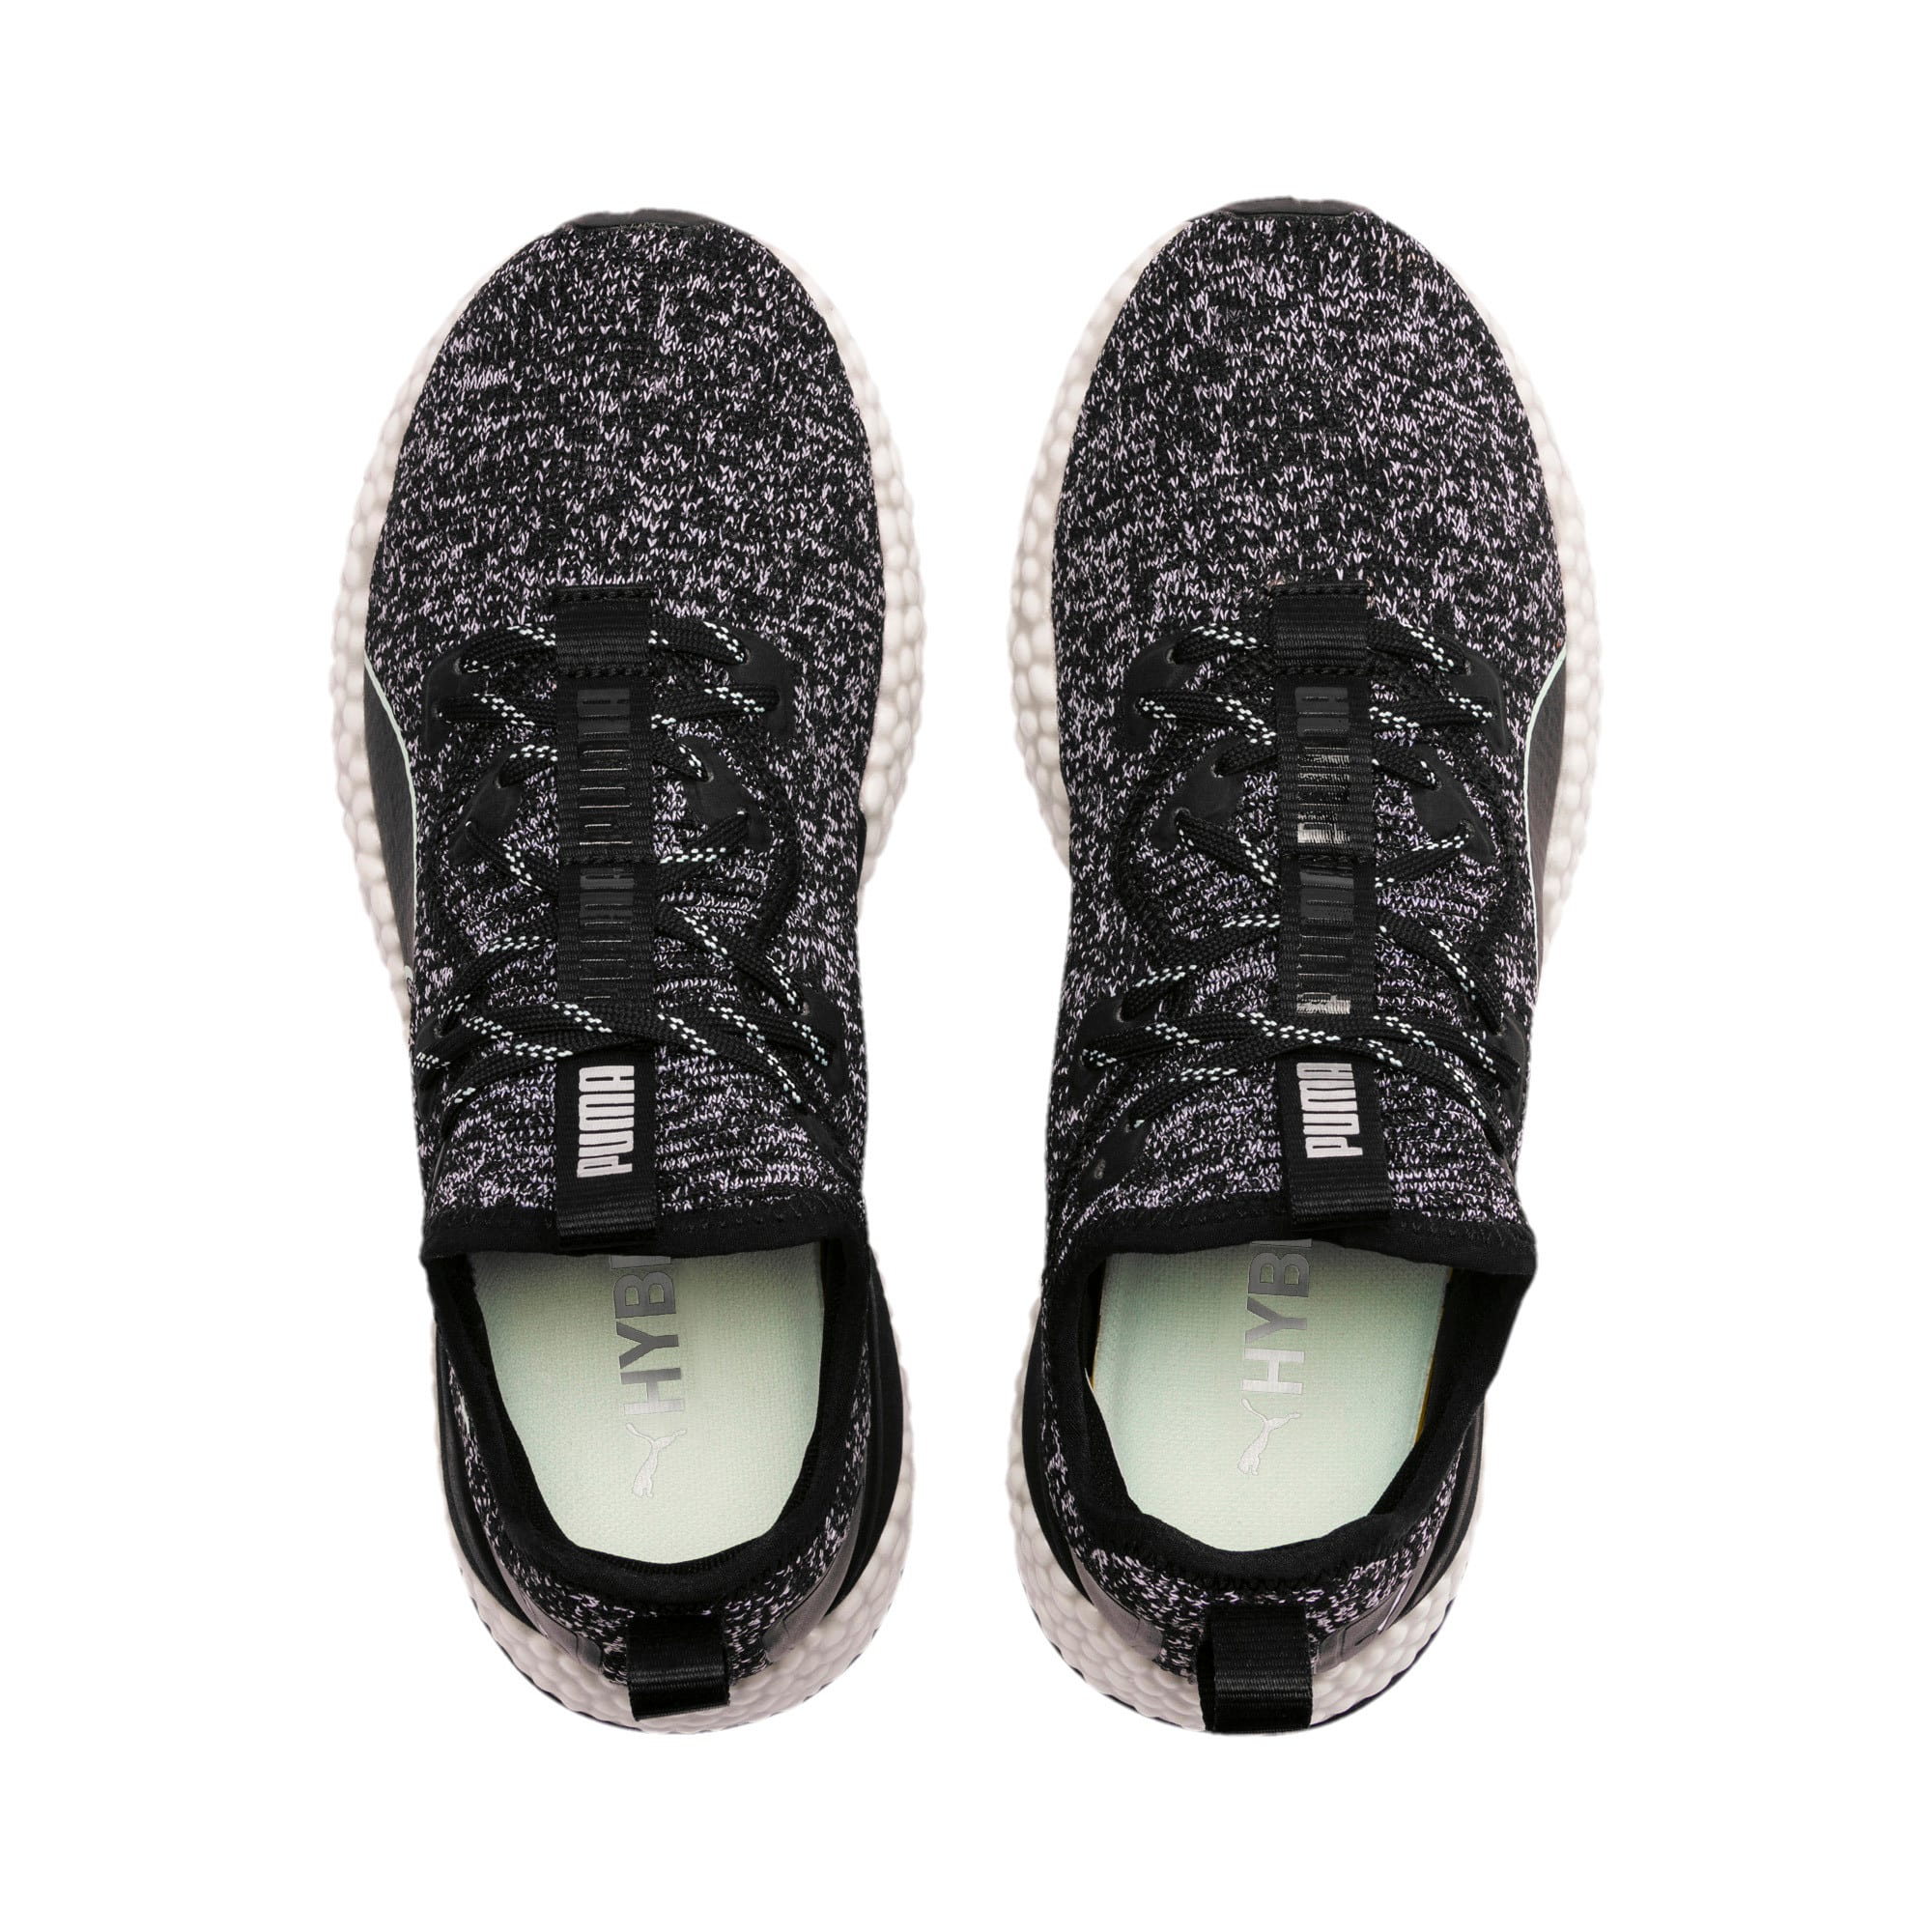 Thumbnail 7 of HYBRID Runner Women's Running Shoes, Puma Black-Fair Aqua, medium